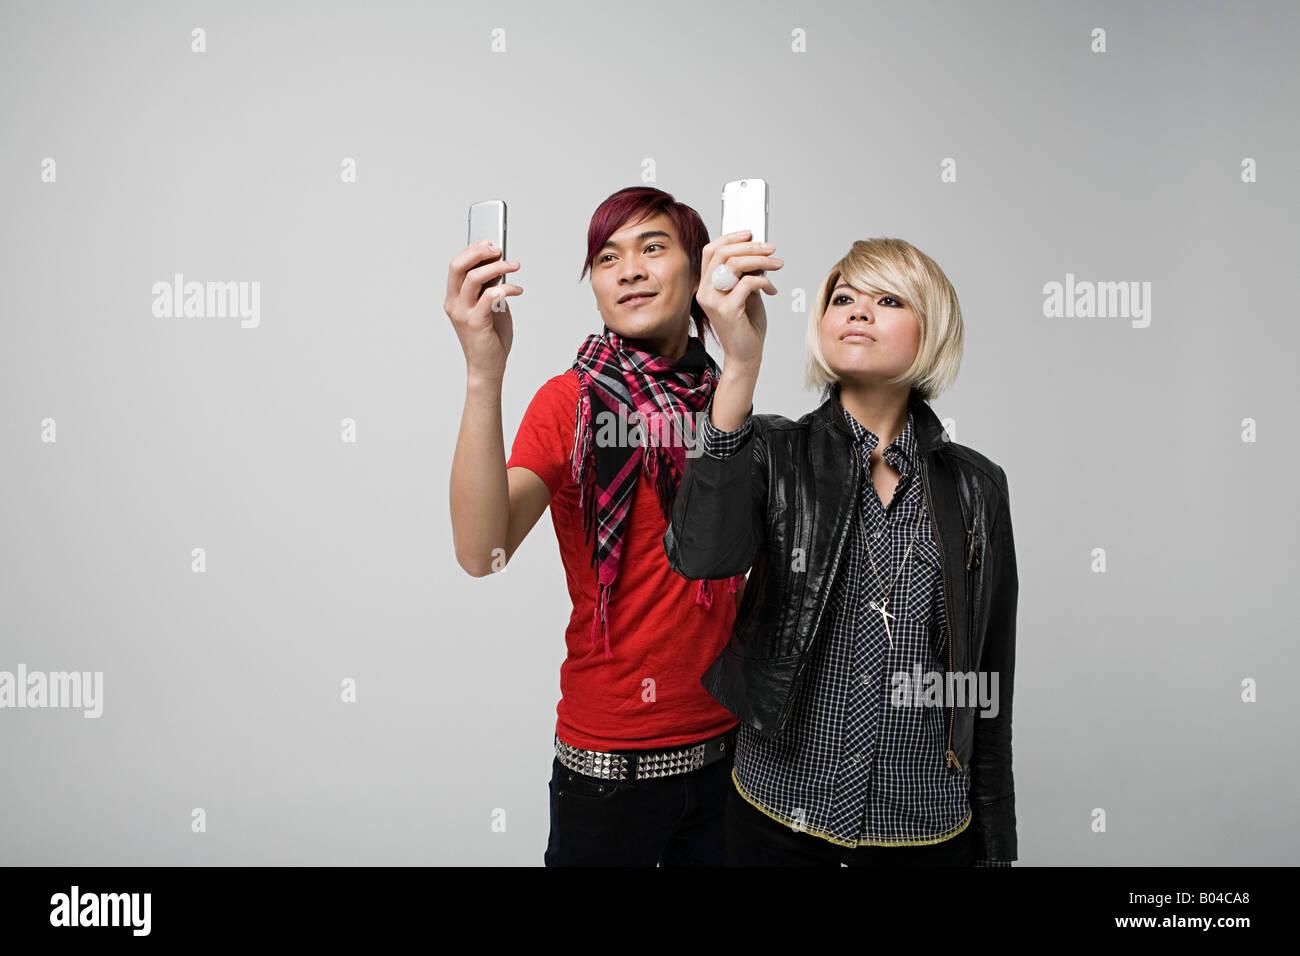 Couple using camera telephones - Stock Image